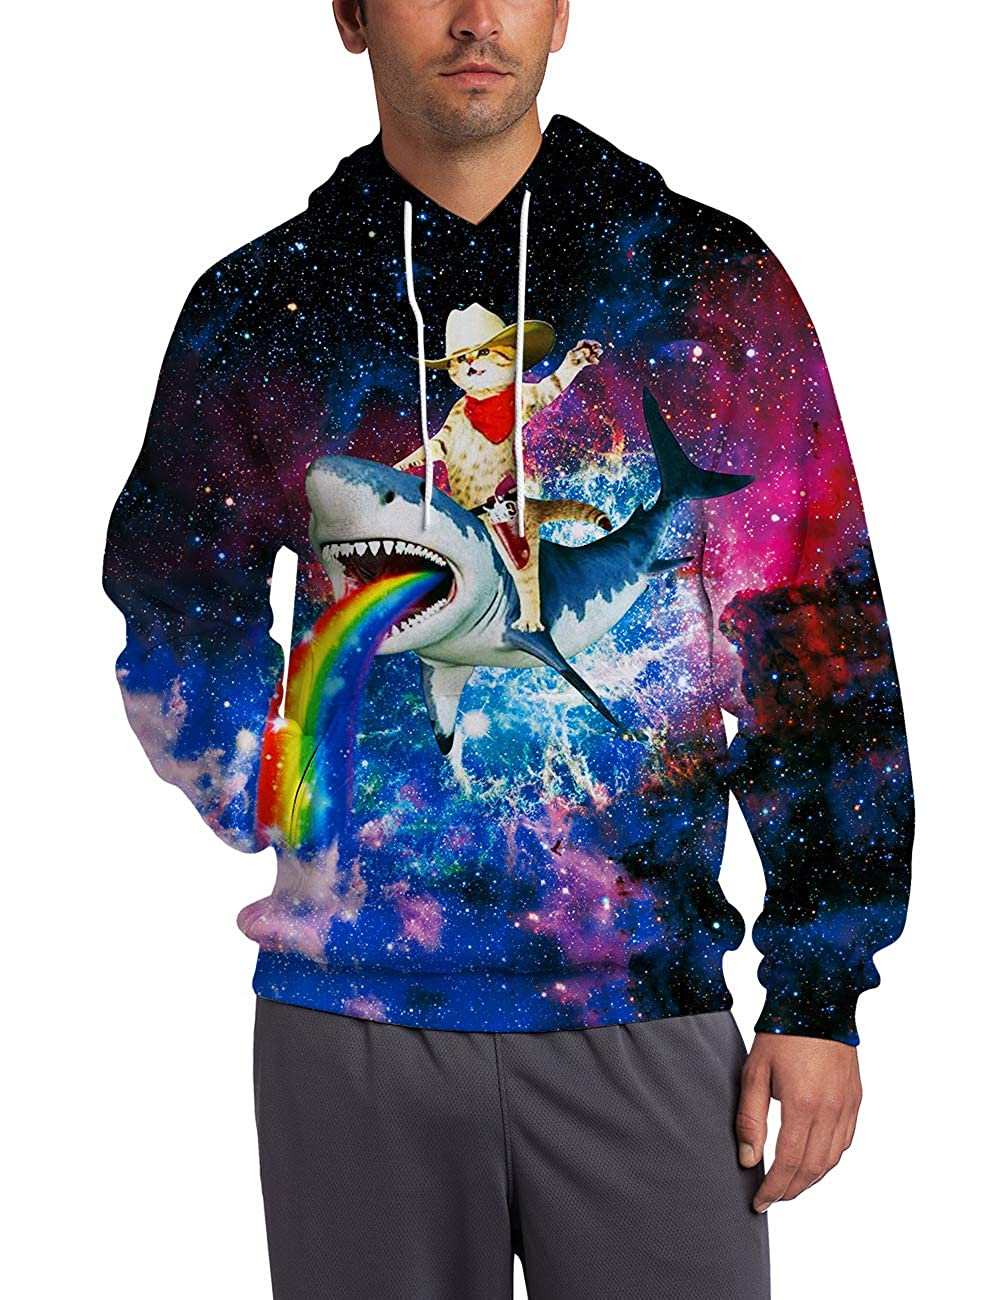 Ahegao Men Women Hoodie Sweatshirt 3D Printed Novelty Galaxy Cool Casual Fleece Pullover with Big Pockets